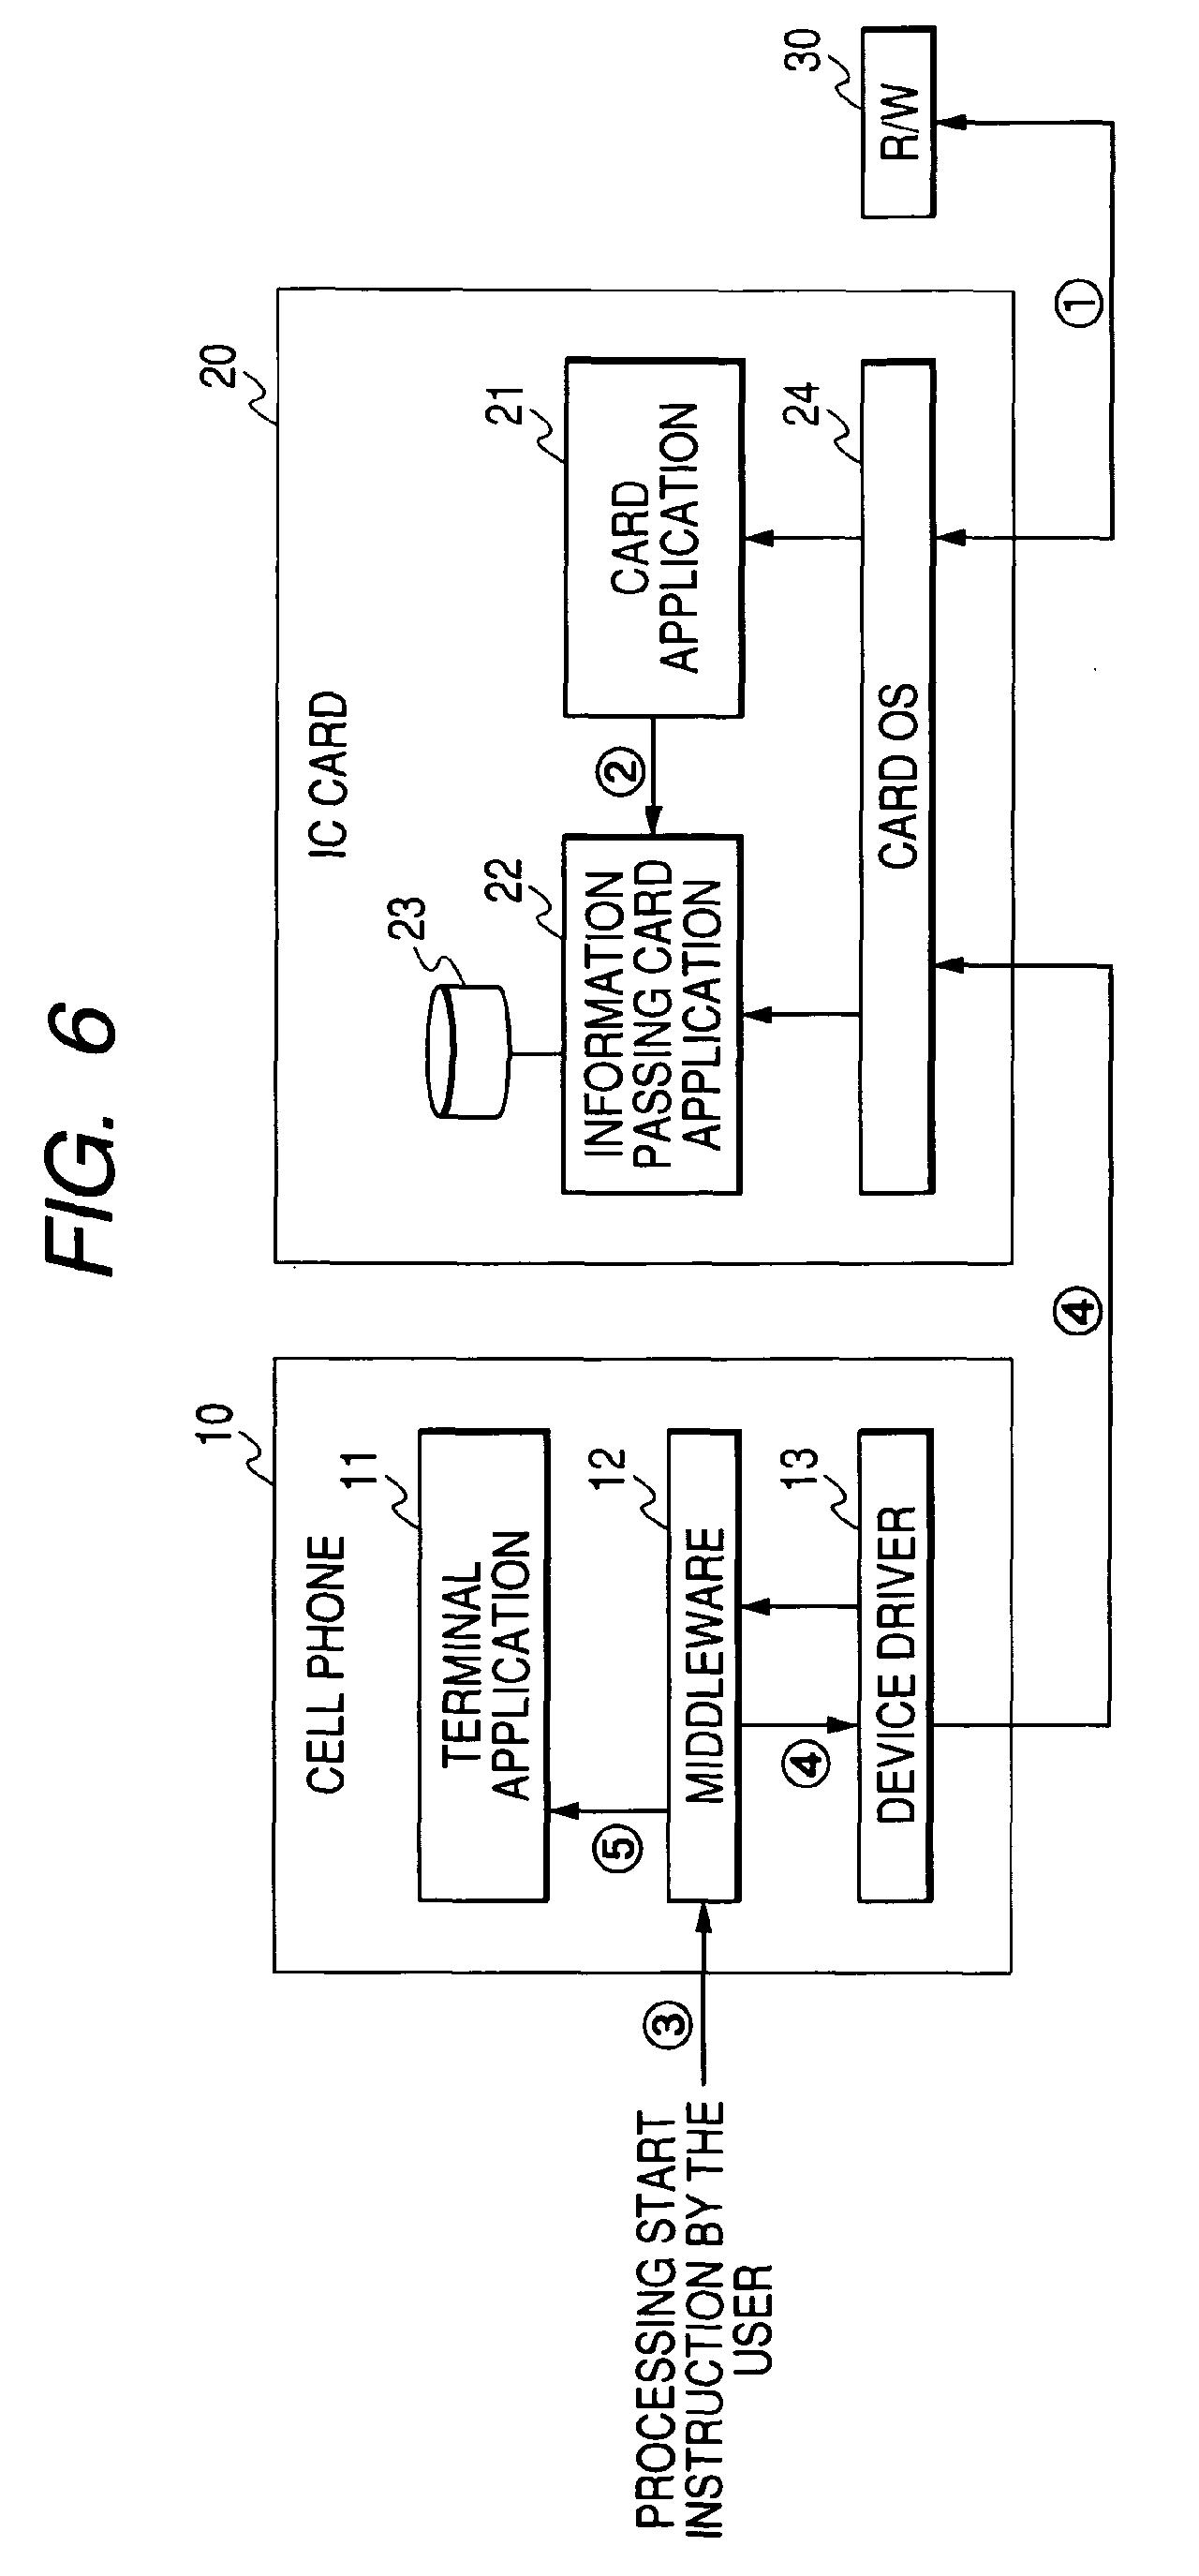 专利ep1548638a2 - dispositif